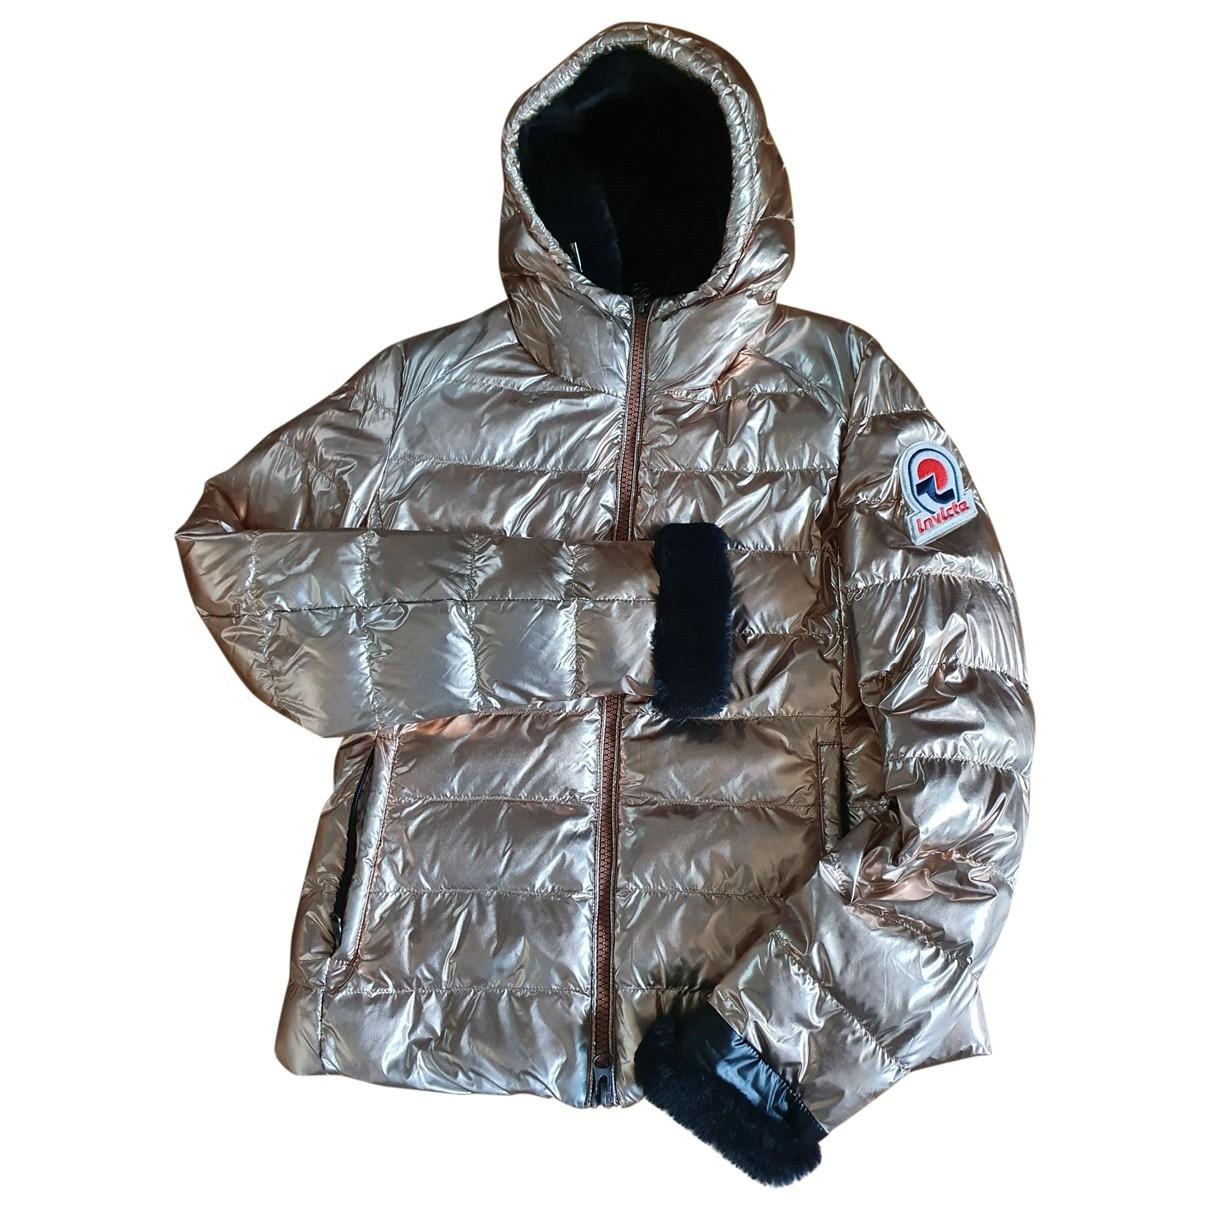 Invicta \N Gold coat for Women M International